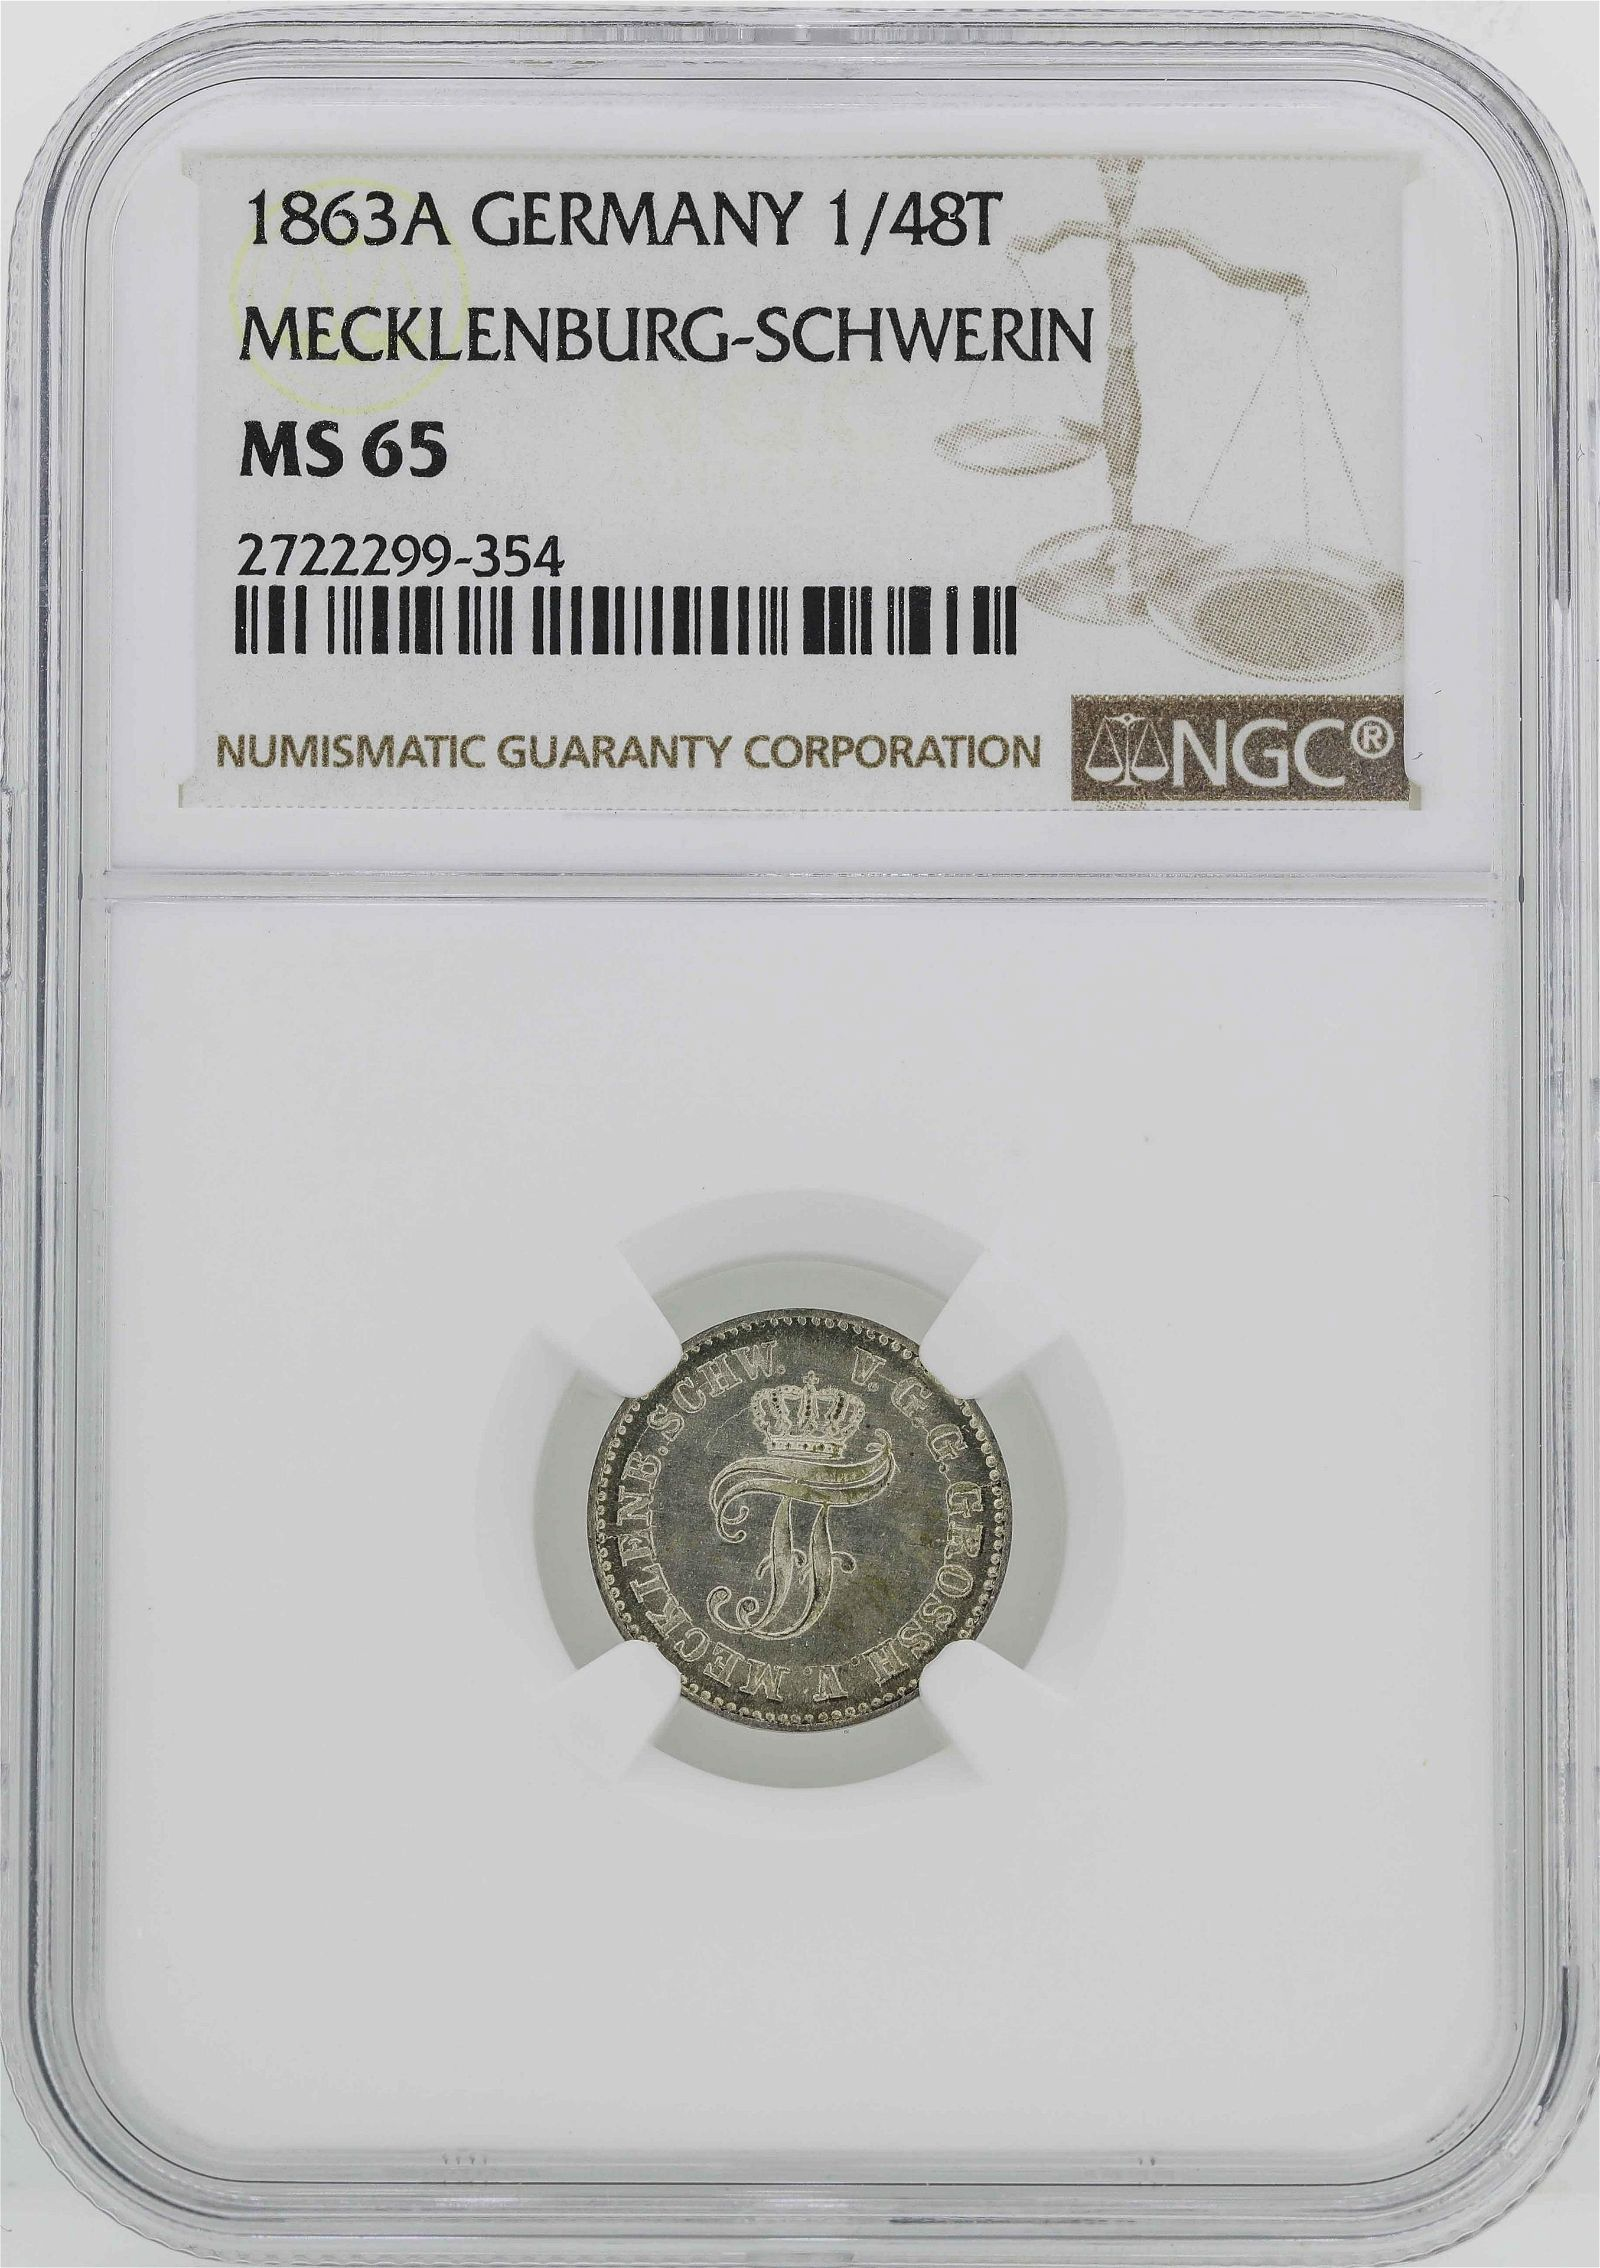 1863-A Germany Friedrich Franz II 1/48 Thaler Coin NGC